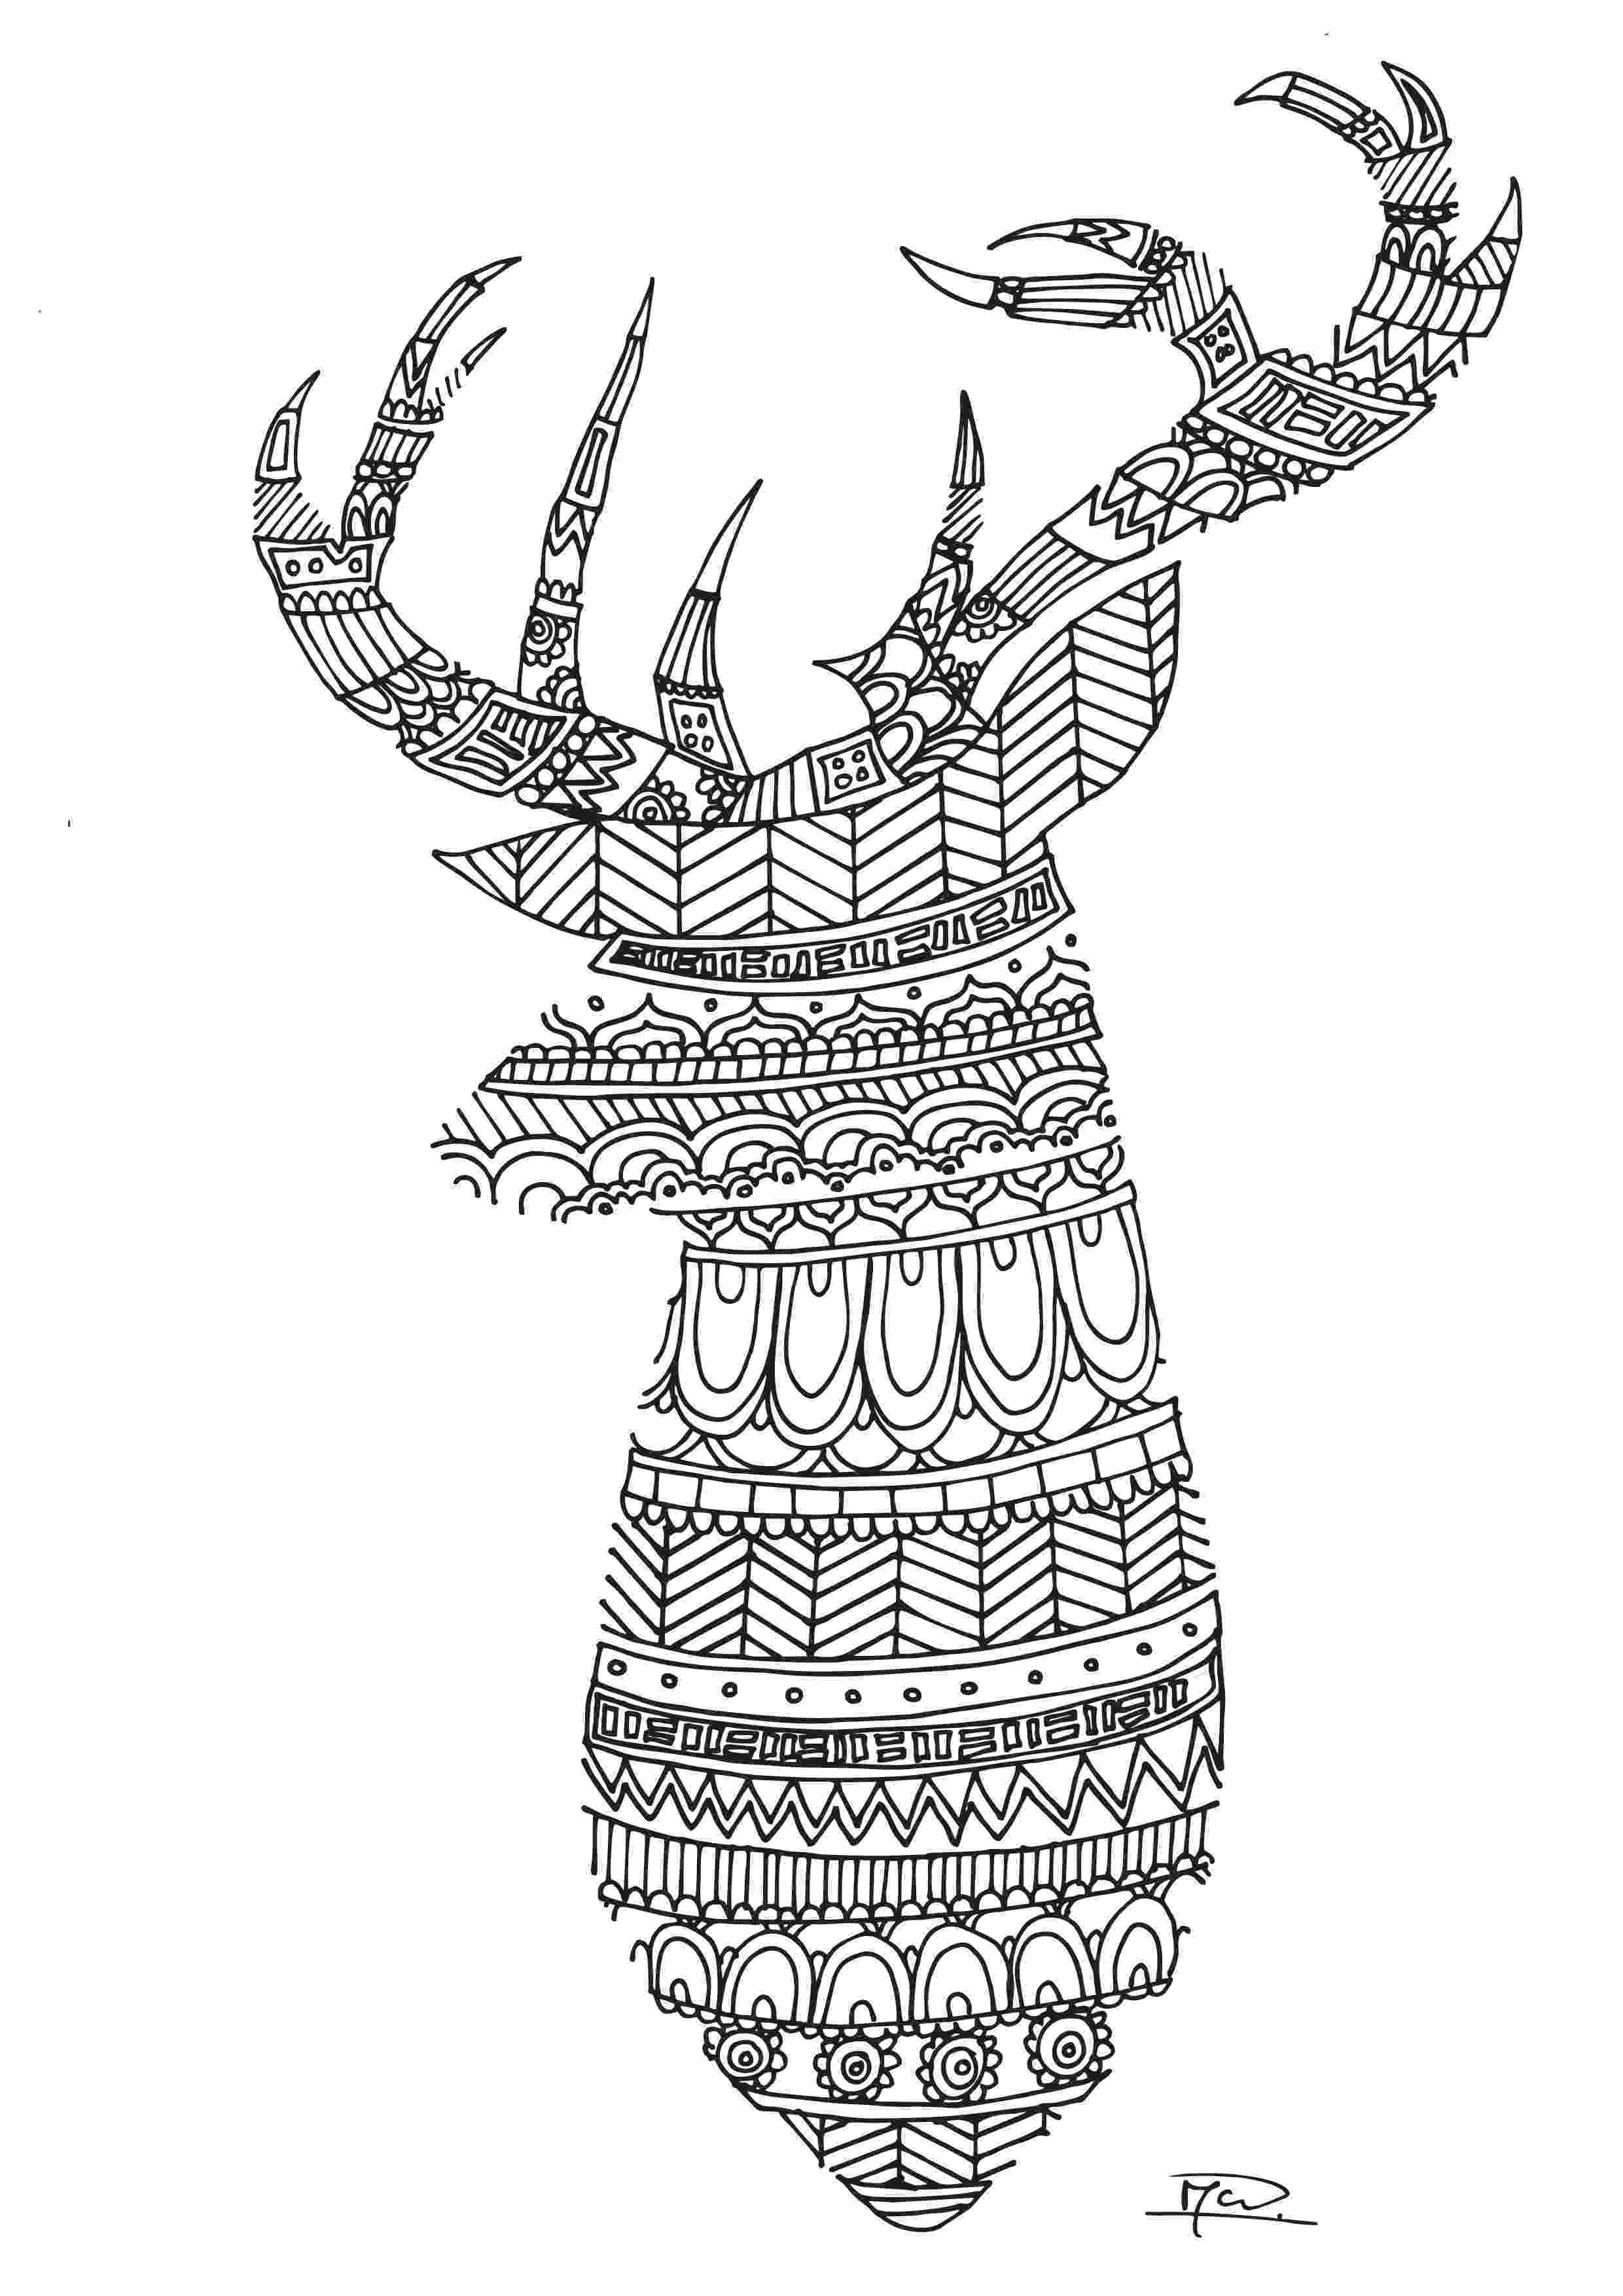 coloring book deer printable deer coloring page free pdf download at http deer book coloring